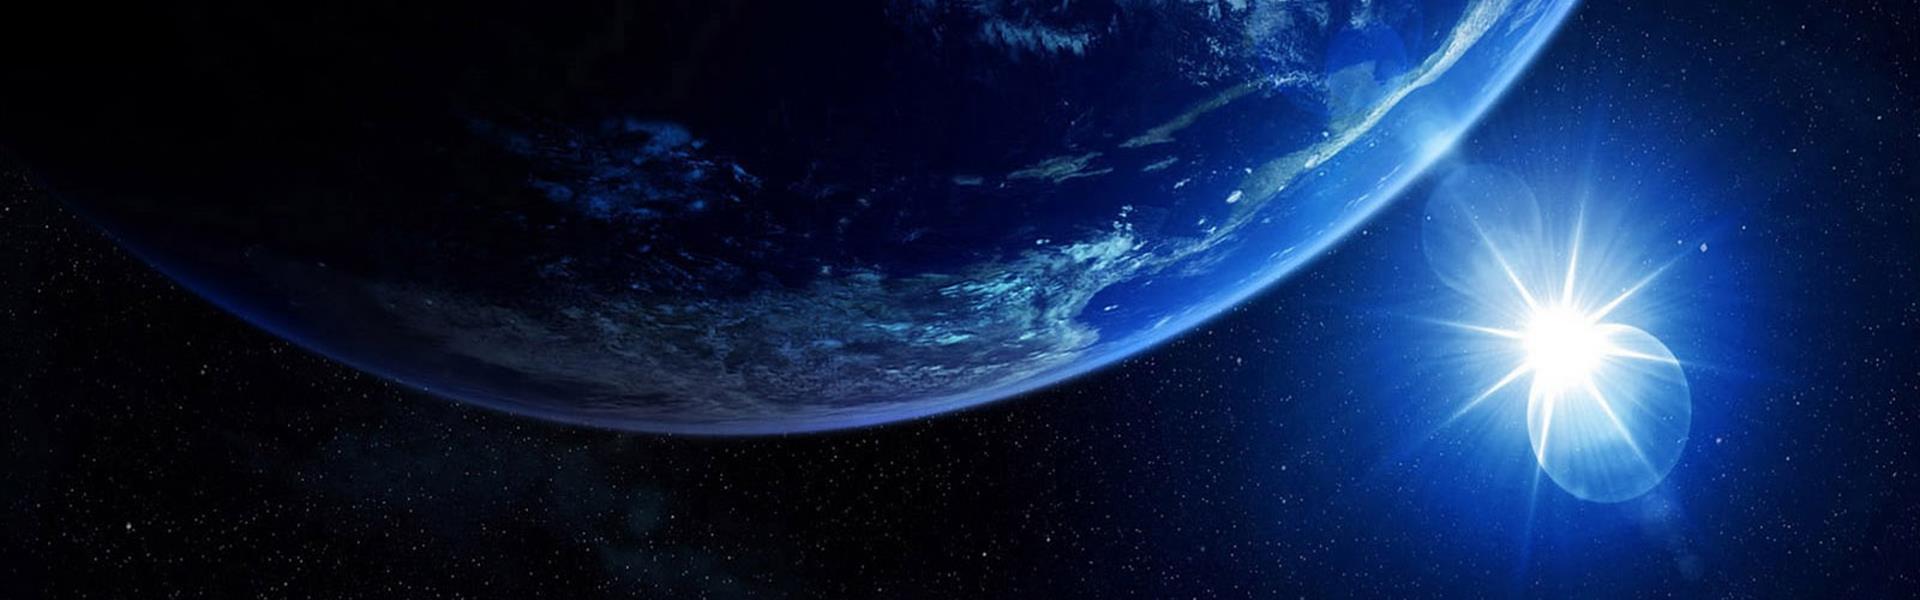 earth sun image global market